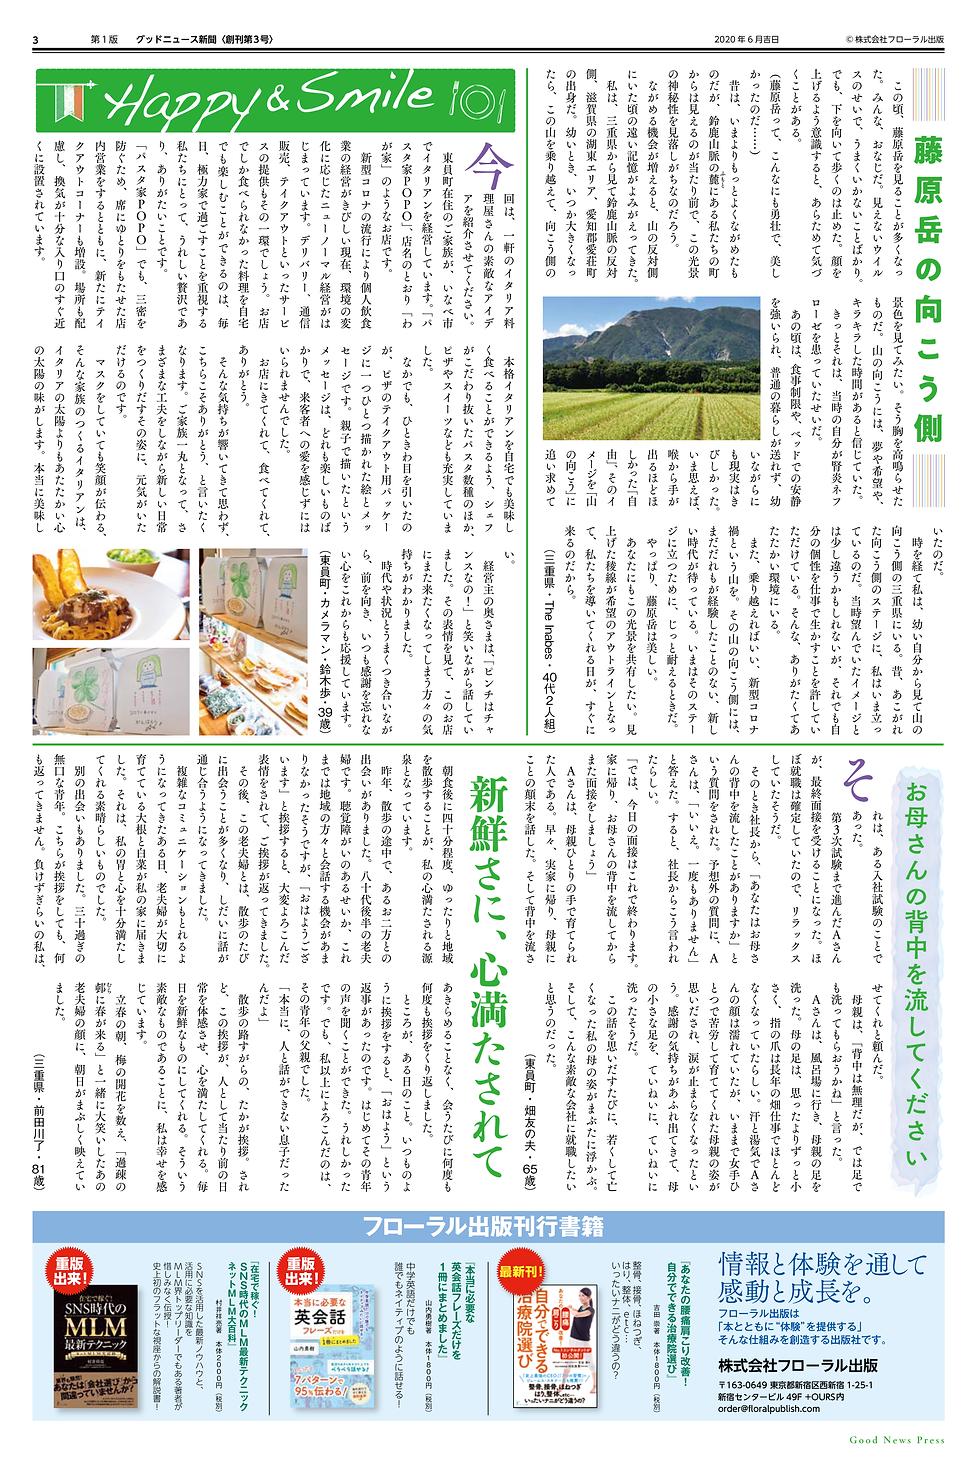 GNP3号 web用_ページ_3.png